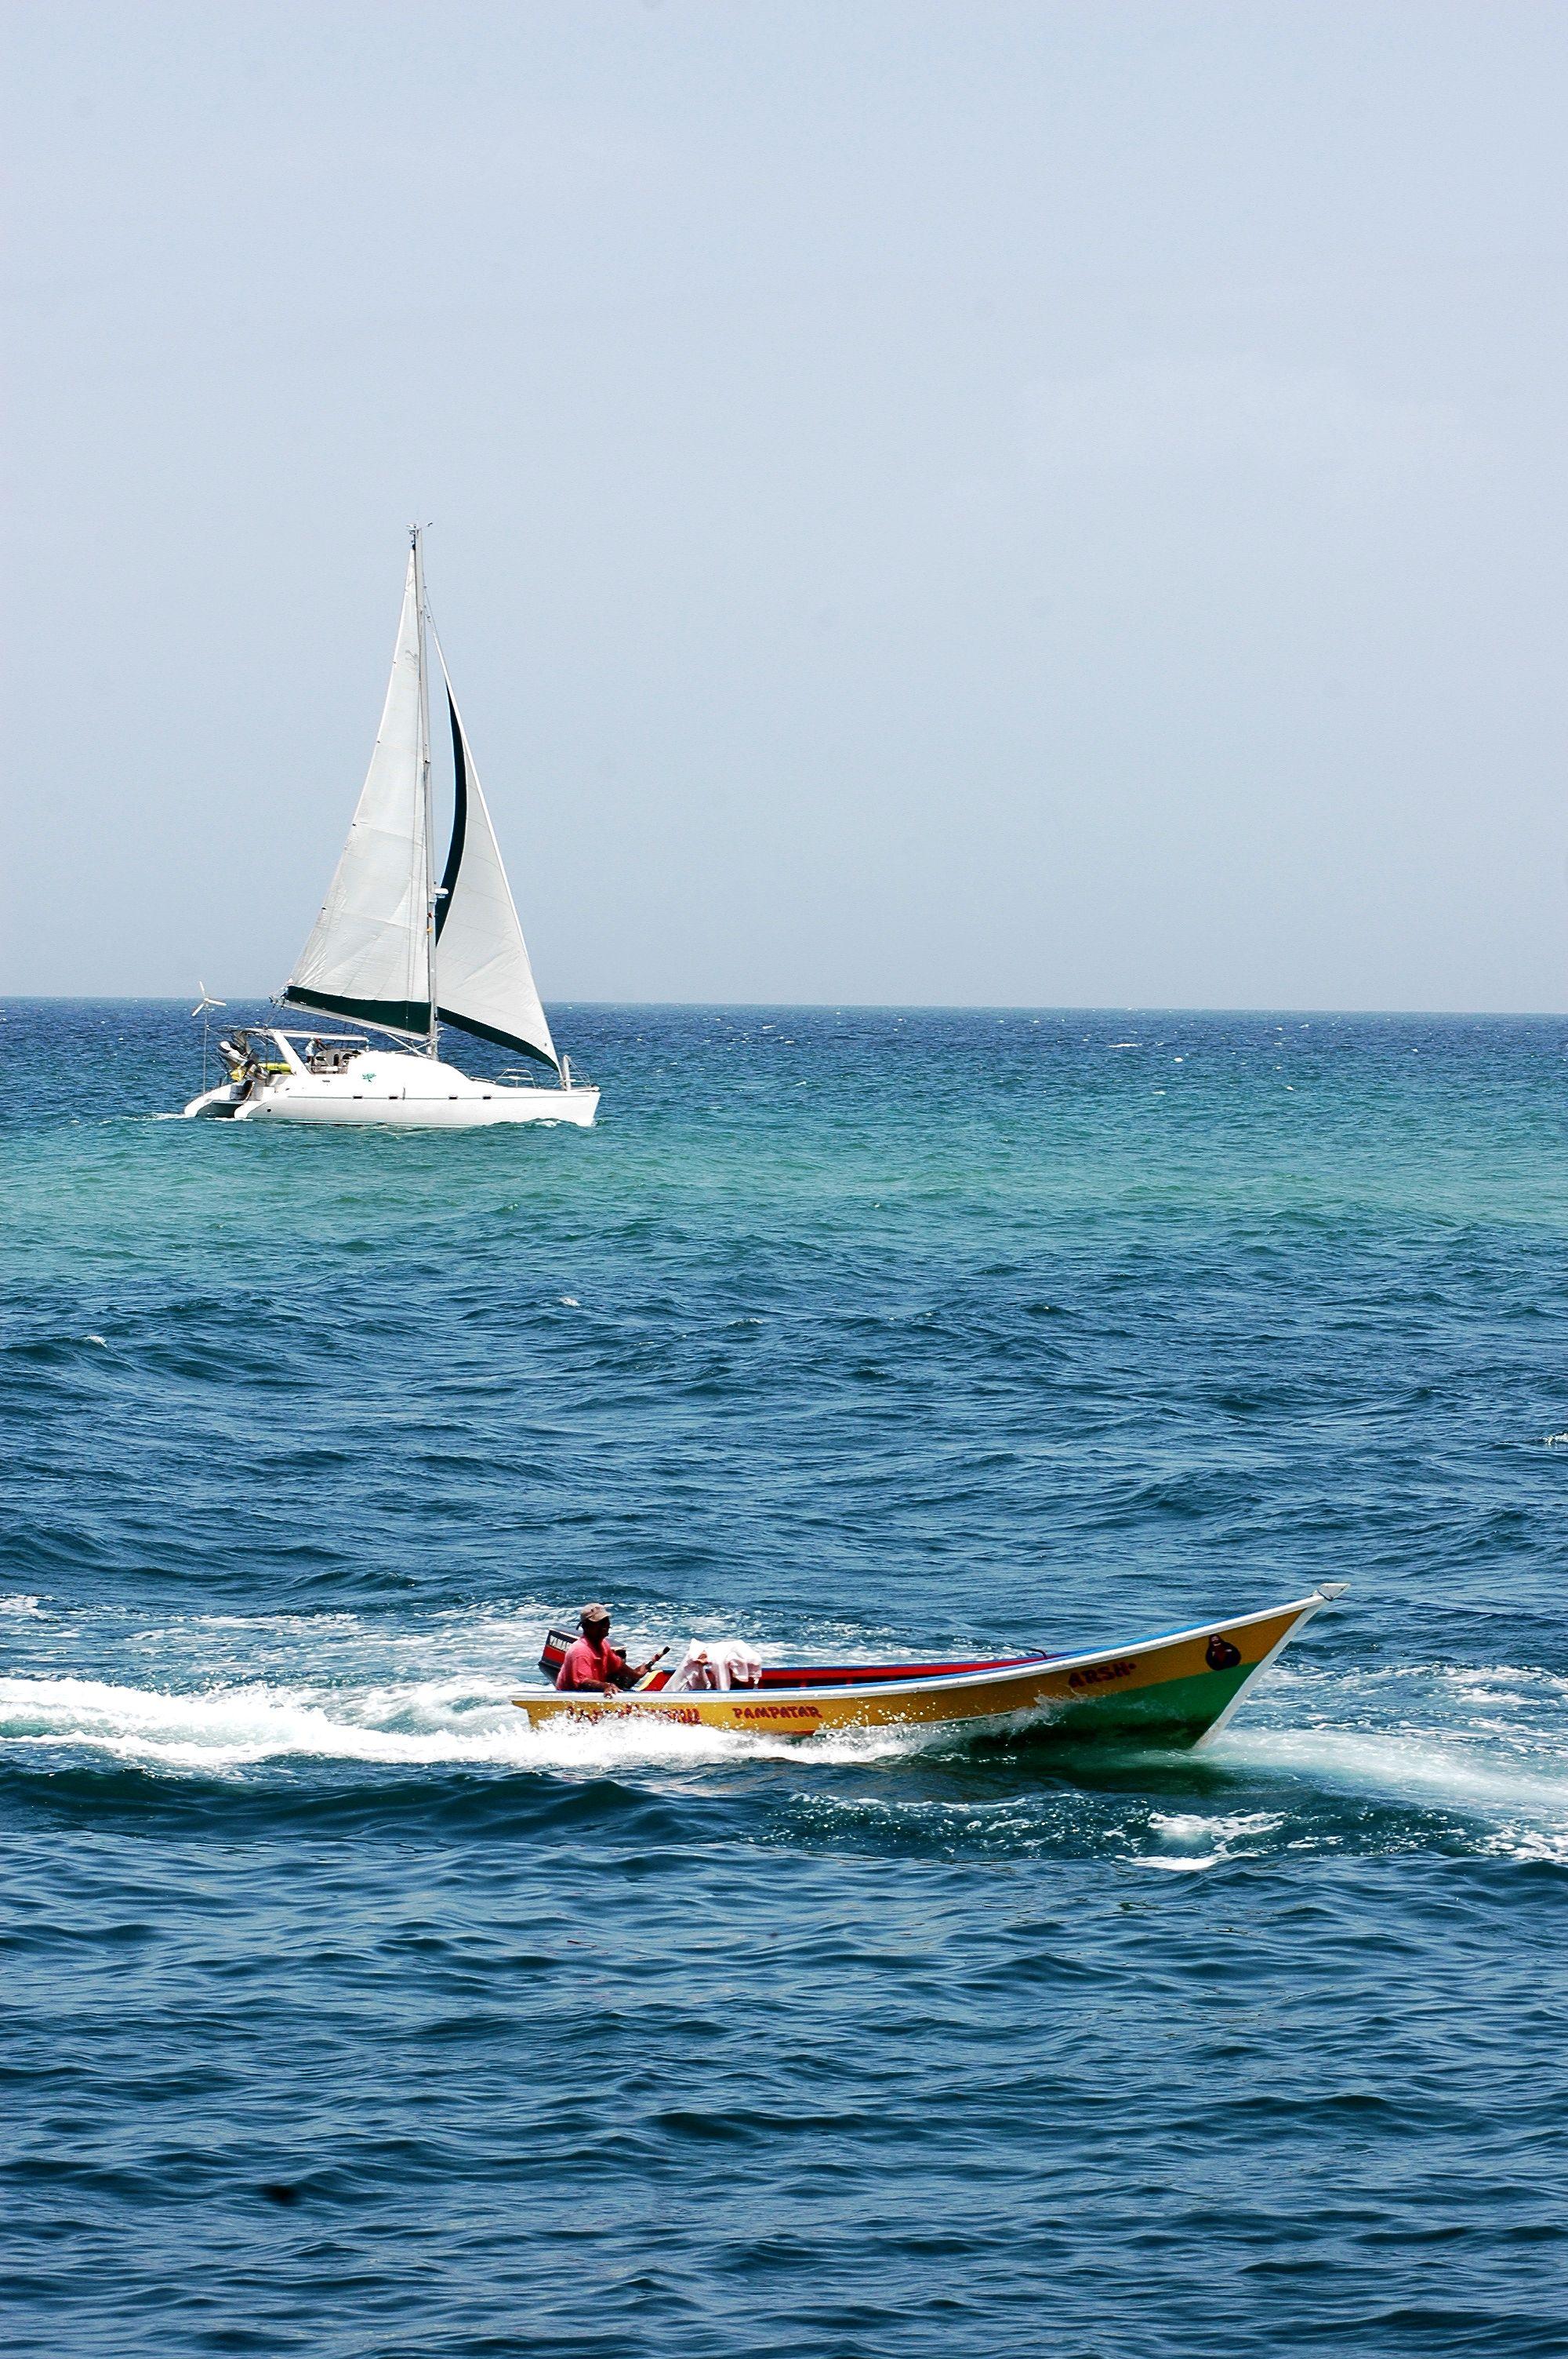 Bahía de inmensa calma donde podrás degustar deliciosos platos a base de pescado #Playa #Venezuela #Gastronomía